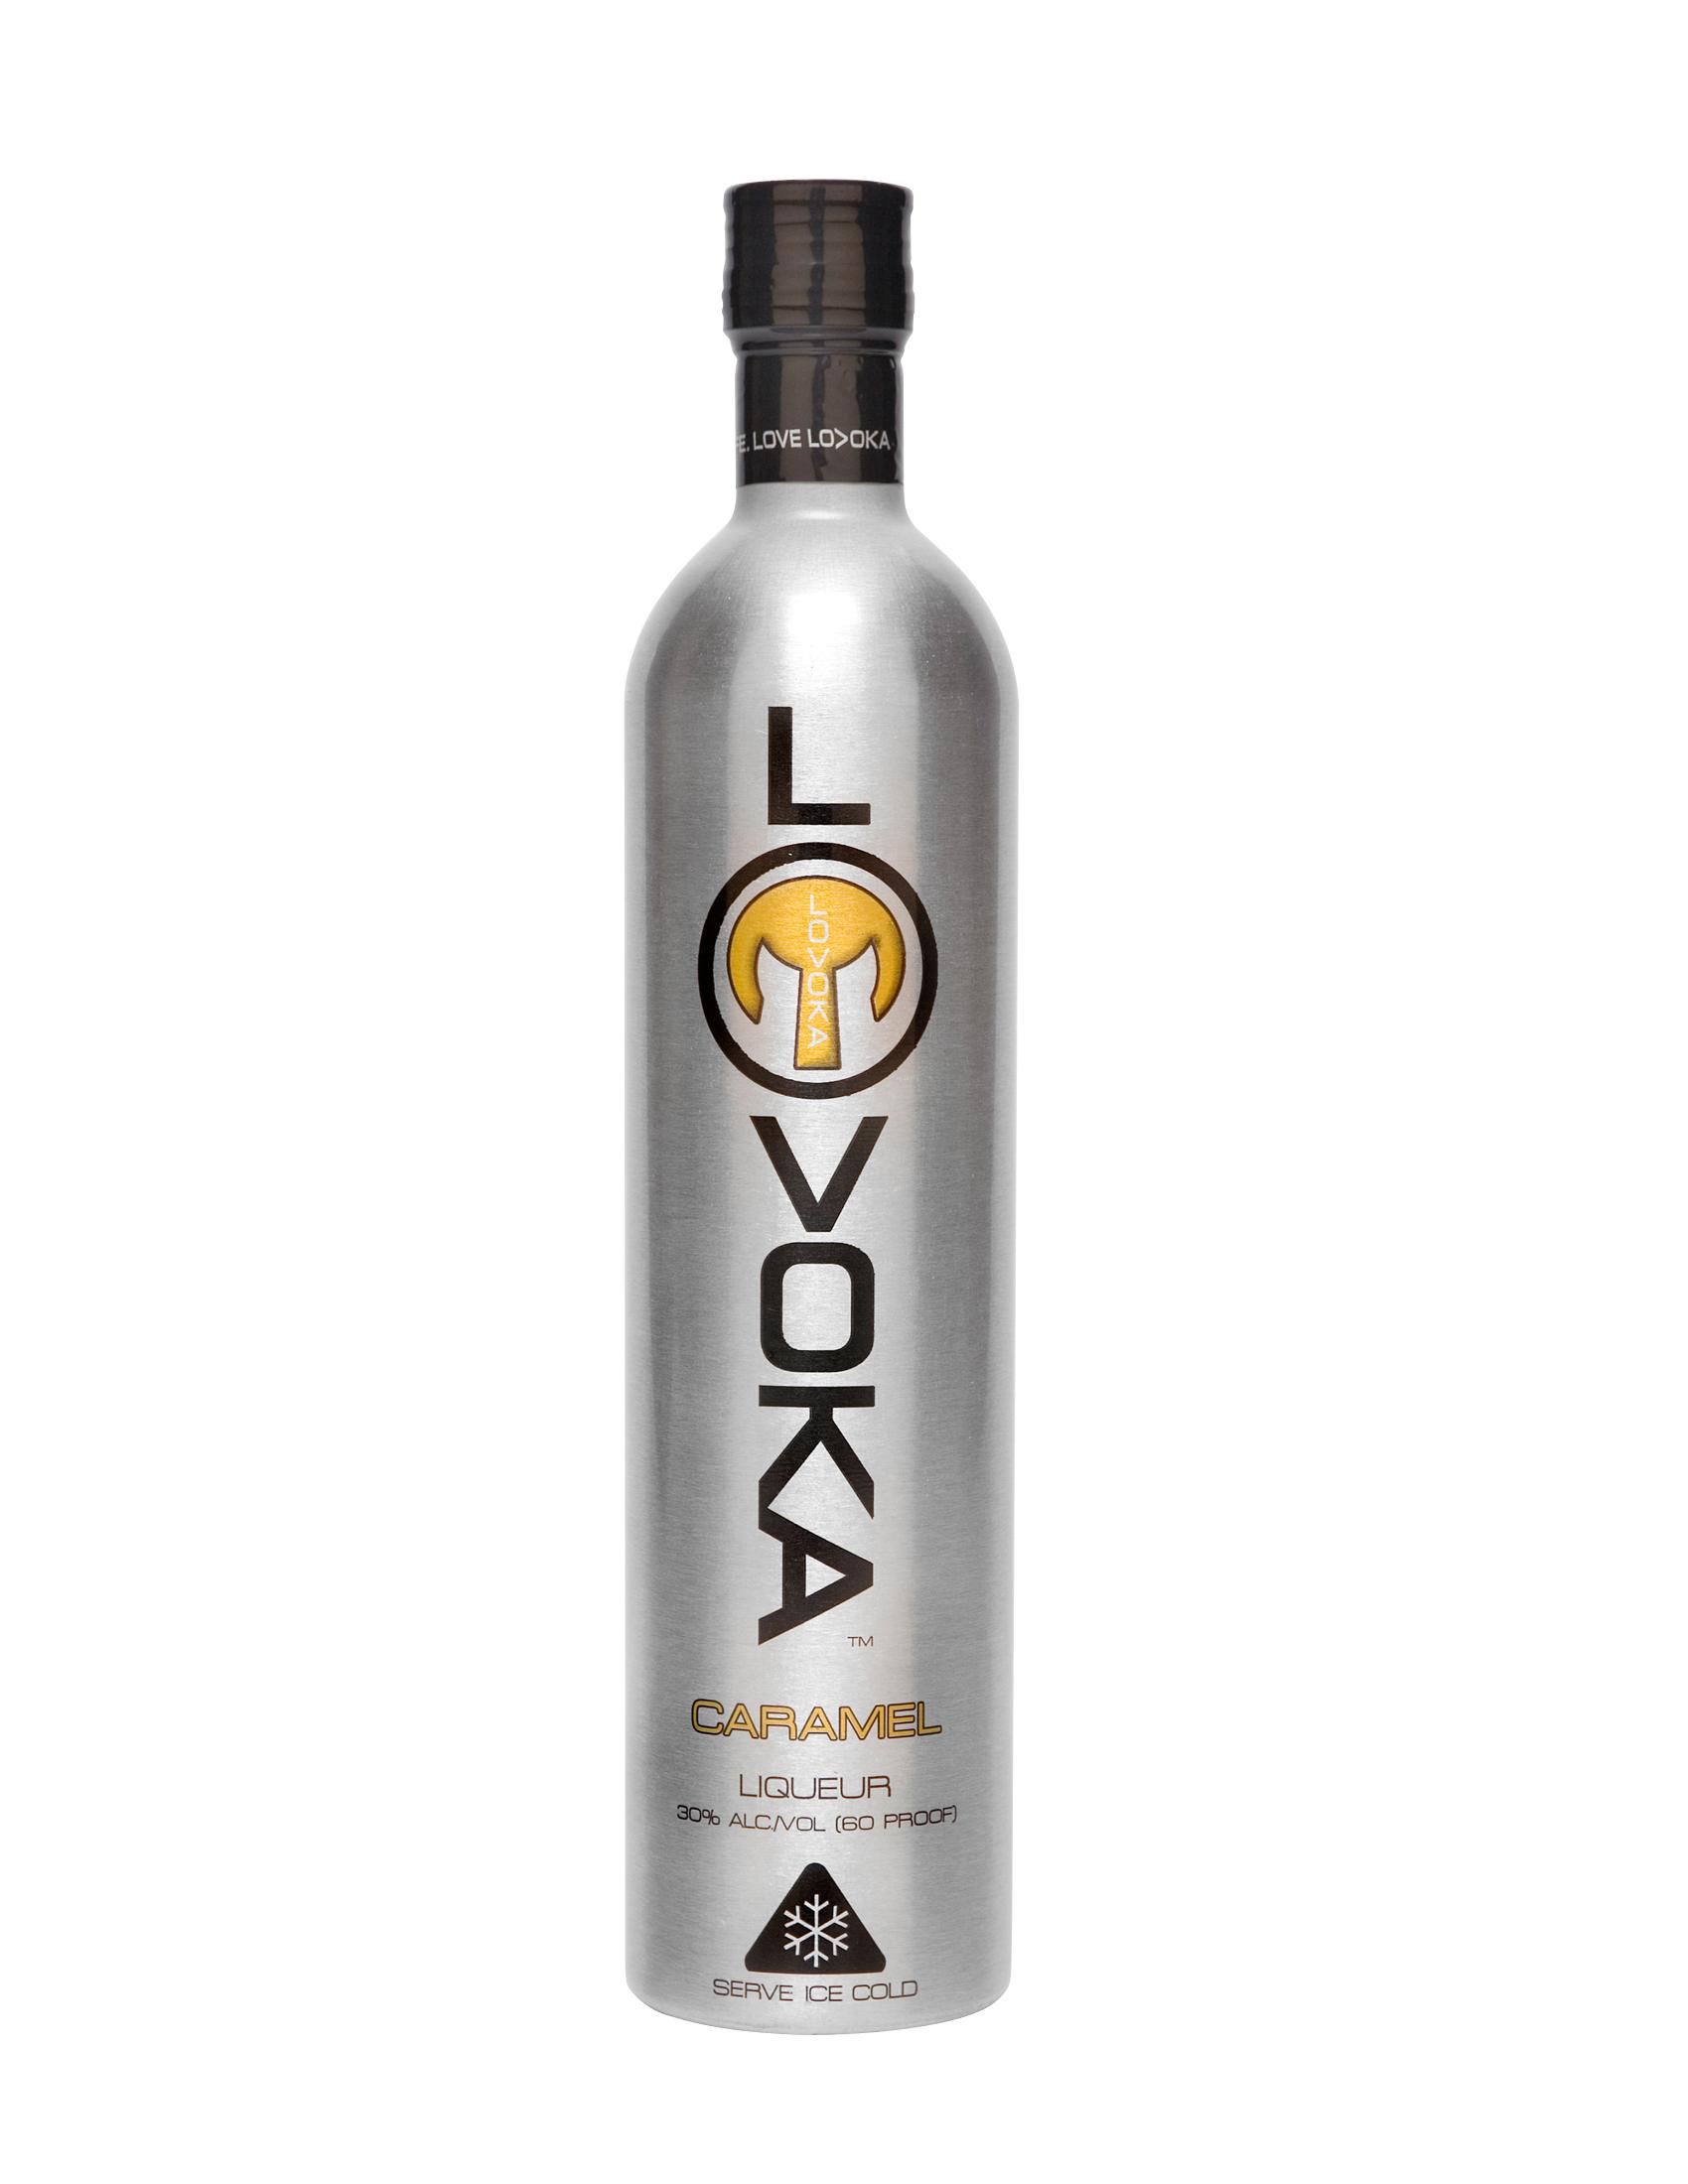 GSN Review: Lovoka Caramel Liqueur | Good Spirits News